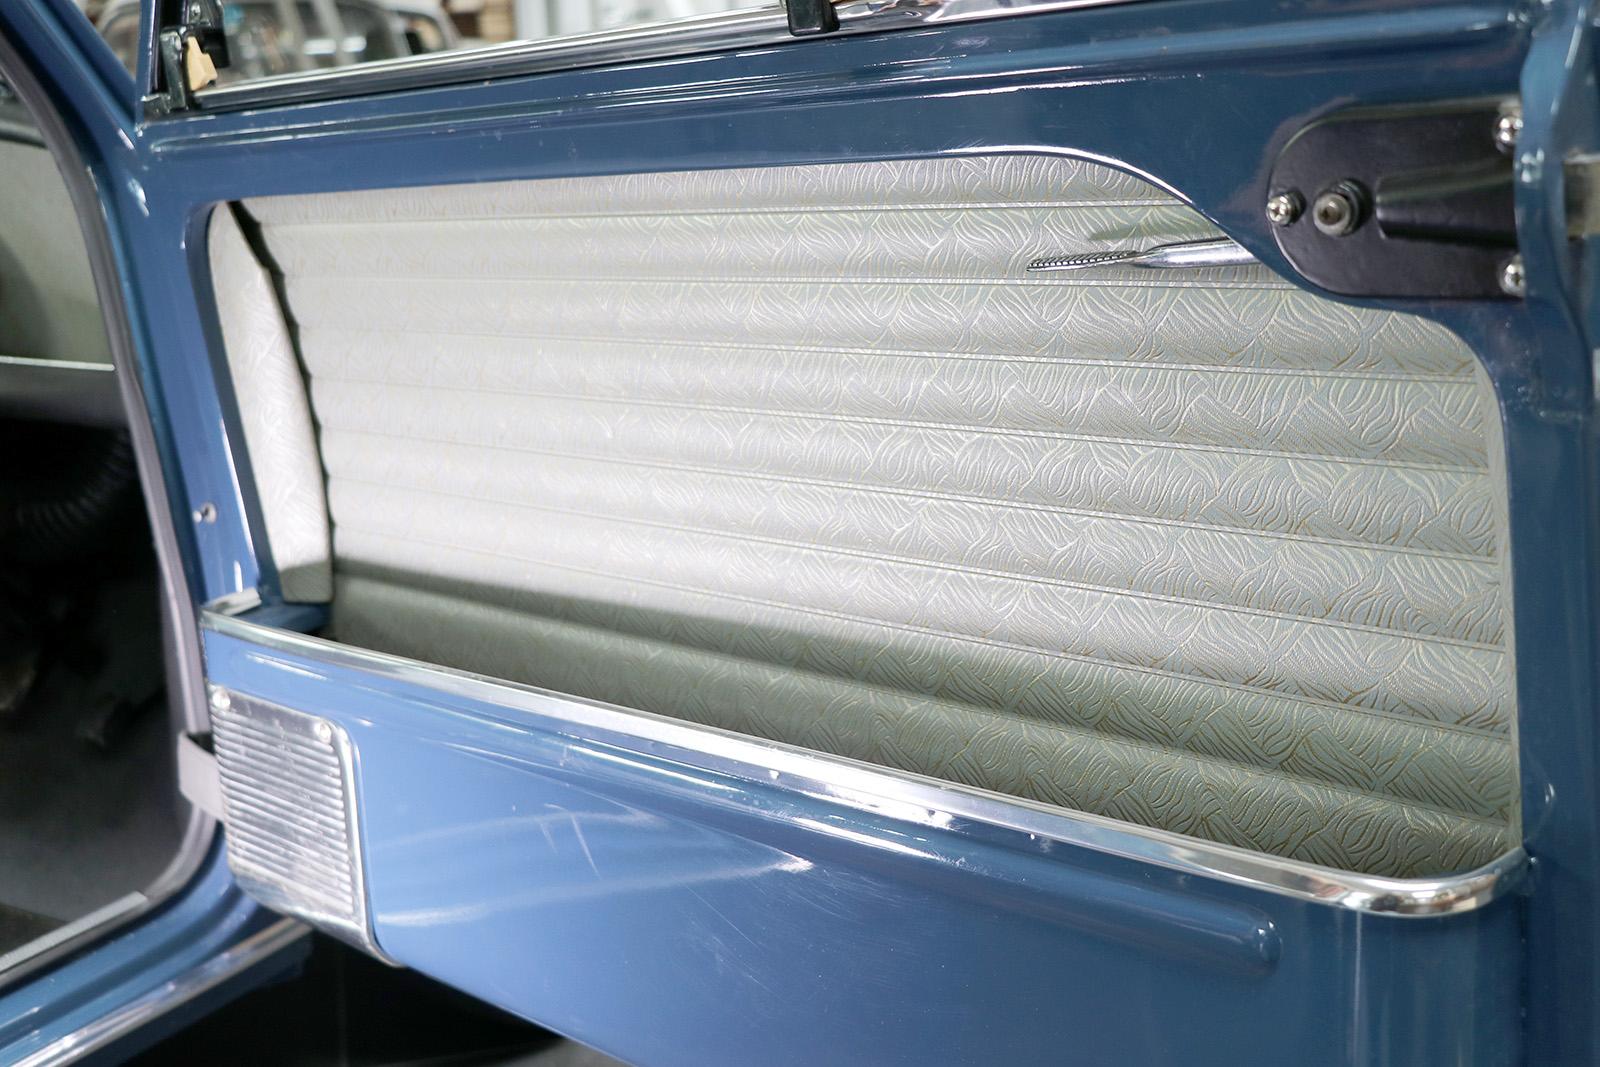 1967 blue 1275 Mini Cooper S Sayer Selection Wilkinson 16 web.jpg